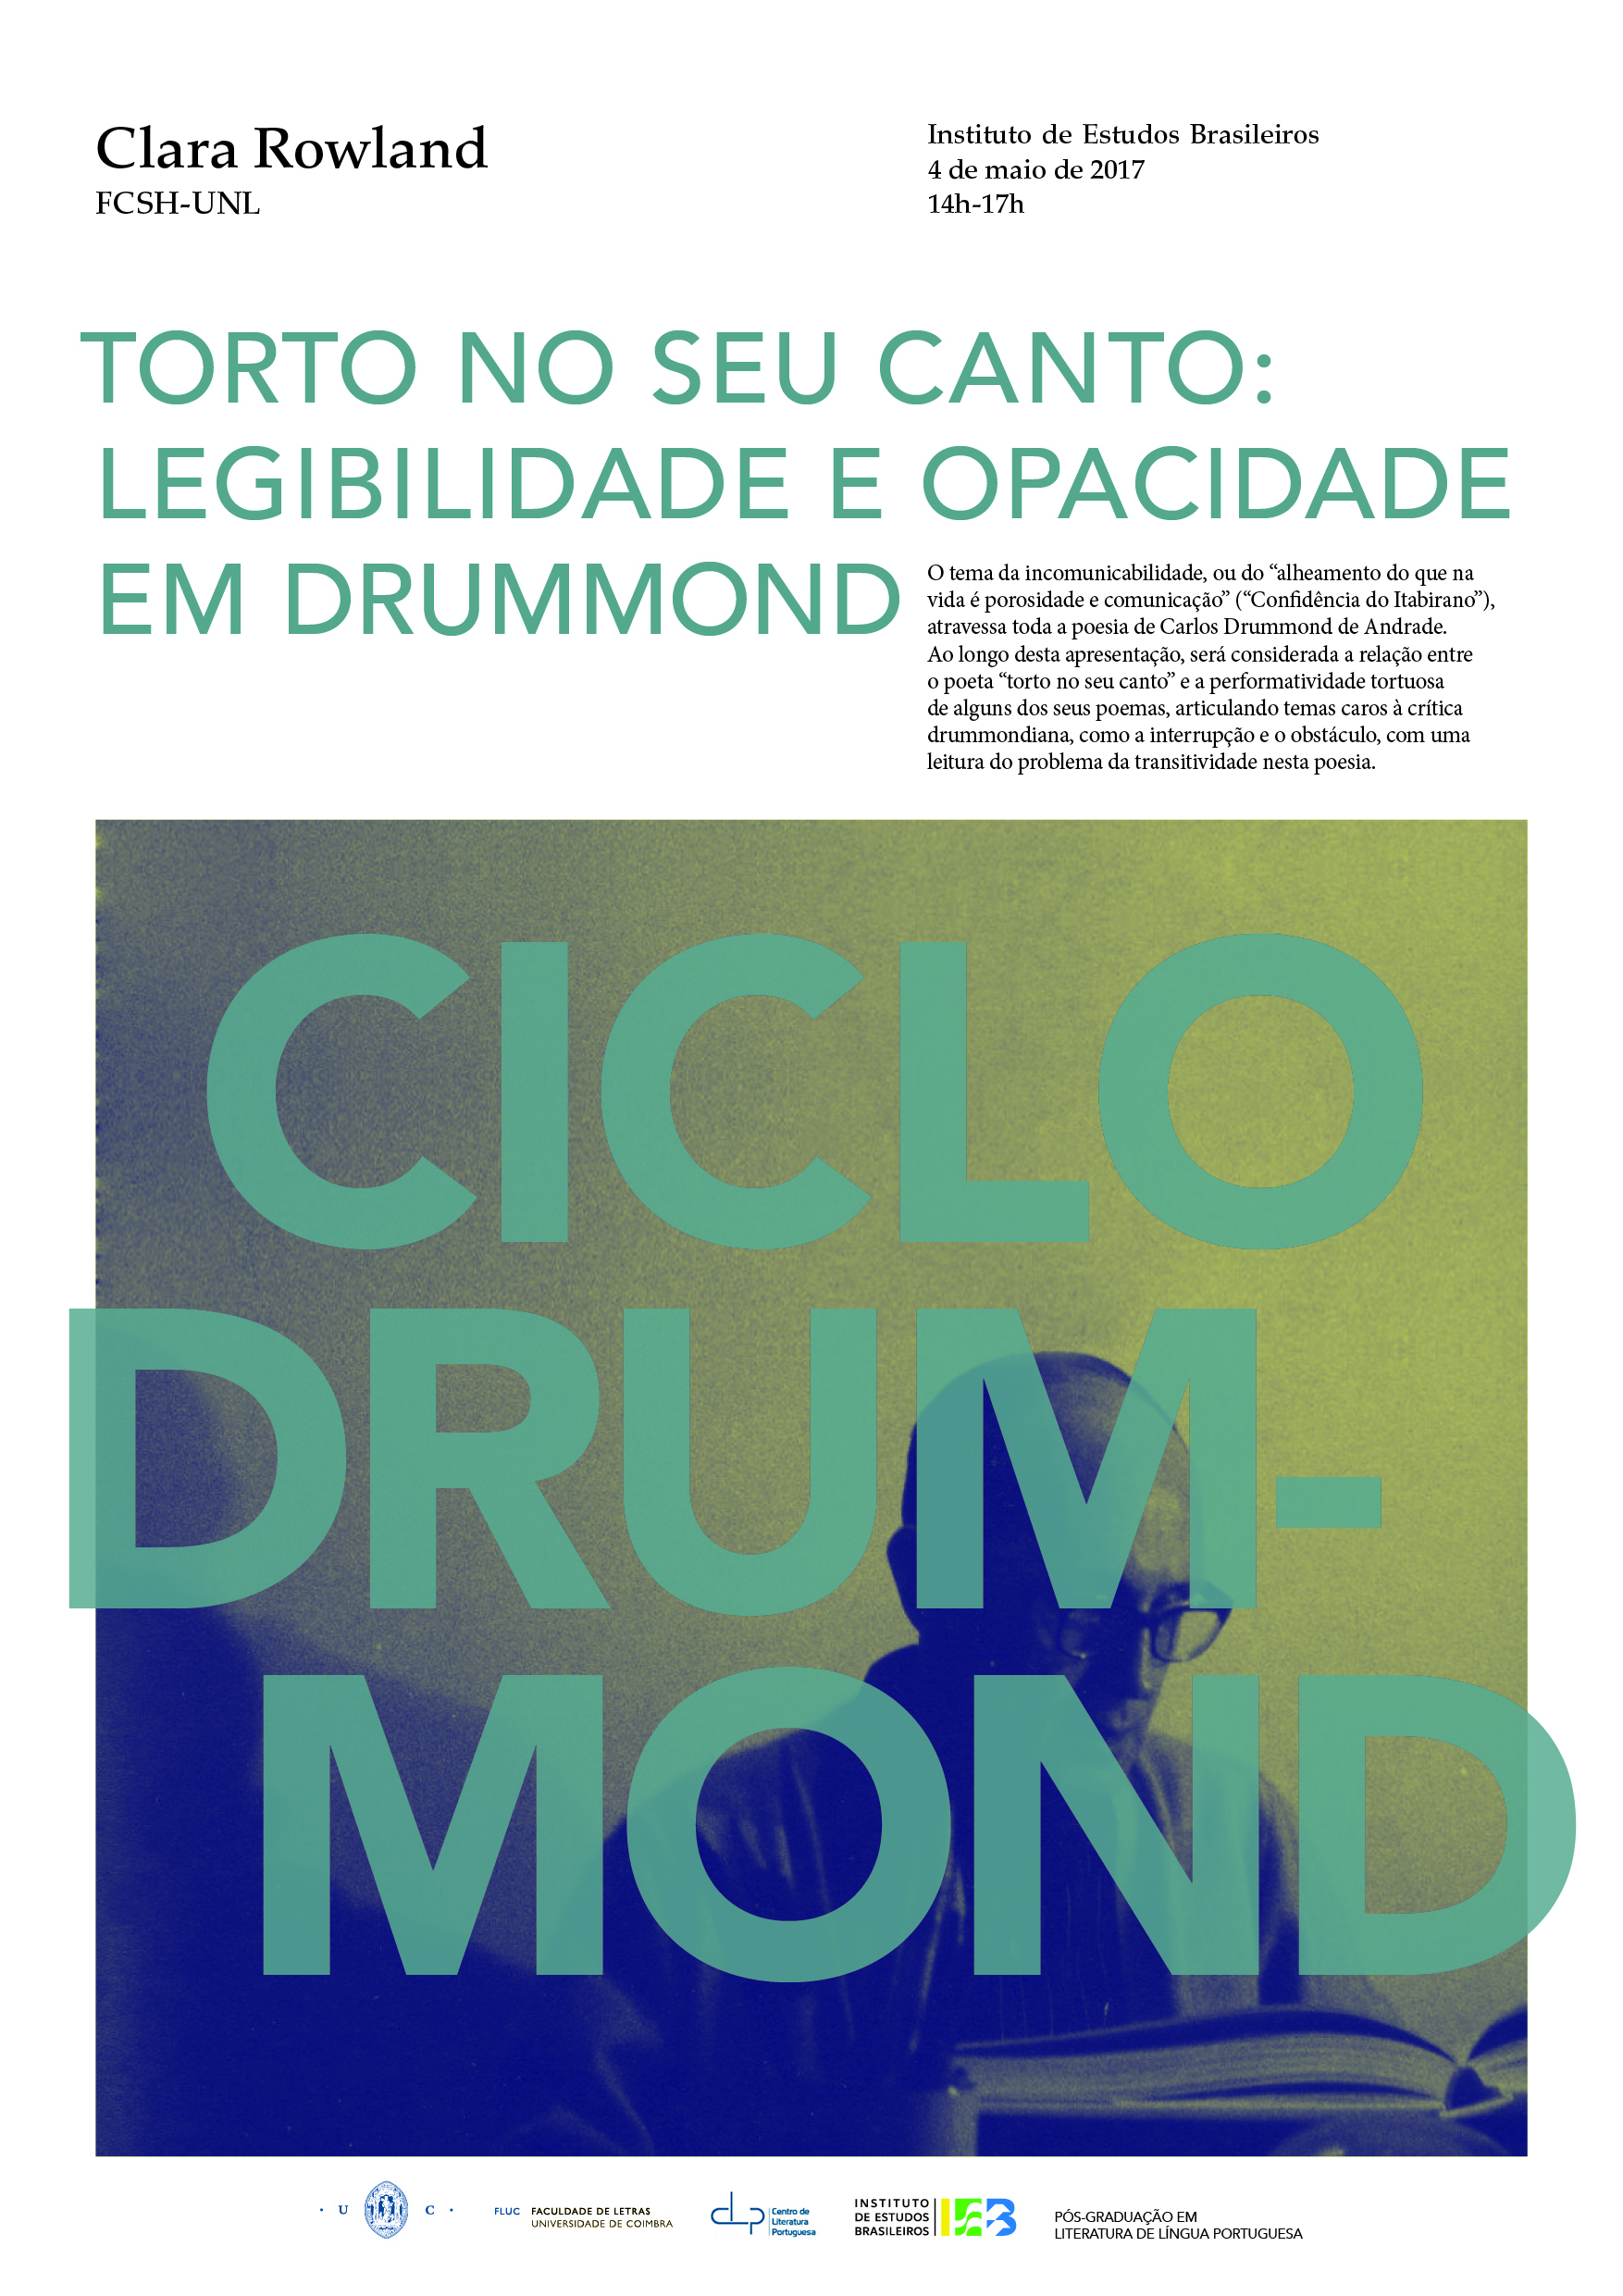 CartazCicloDrummond-CR